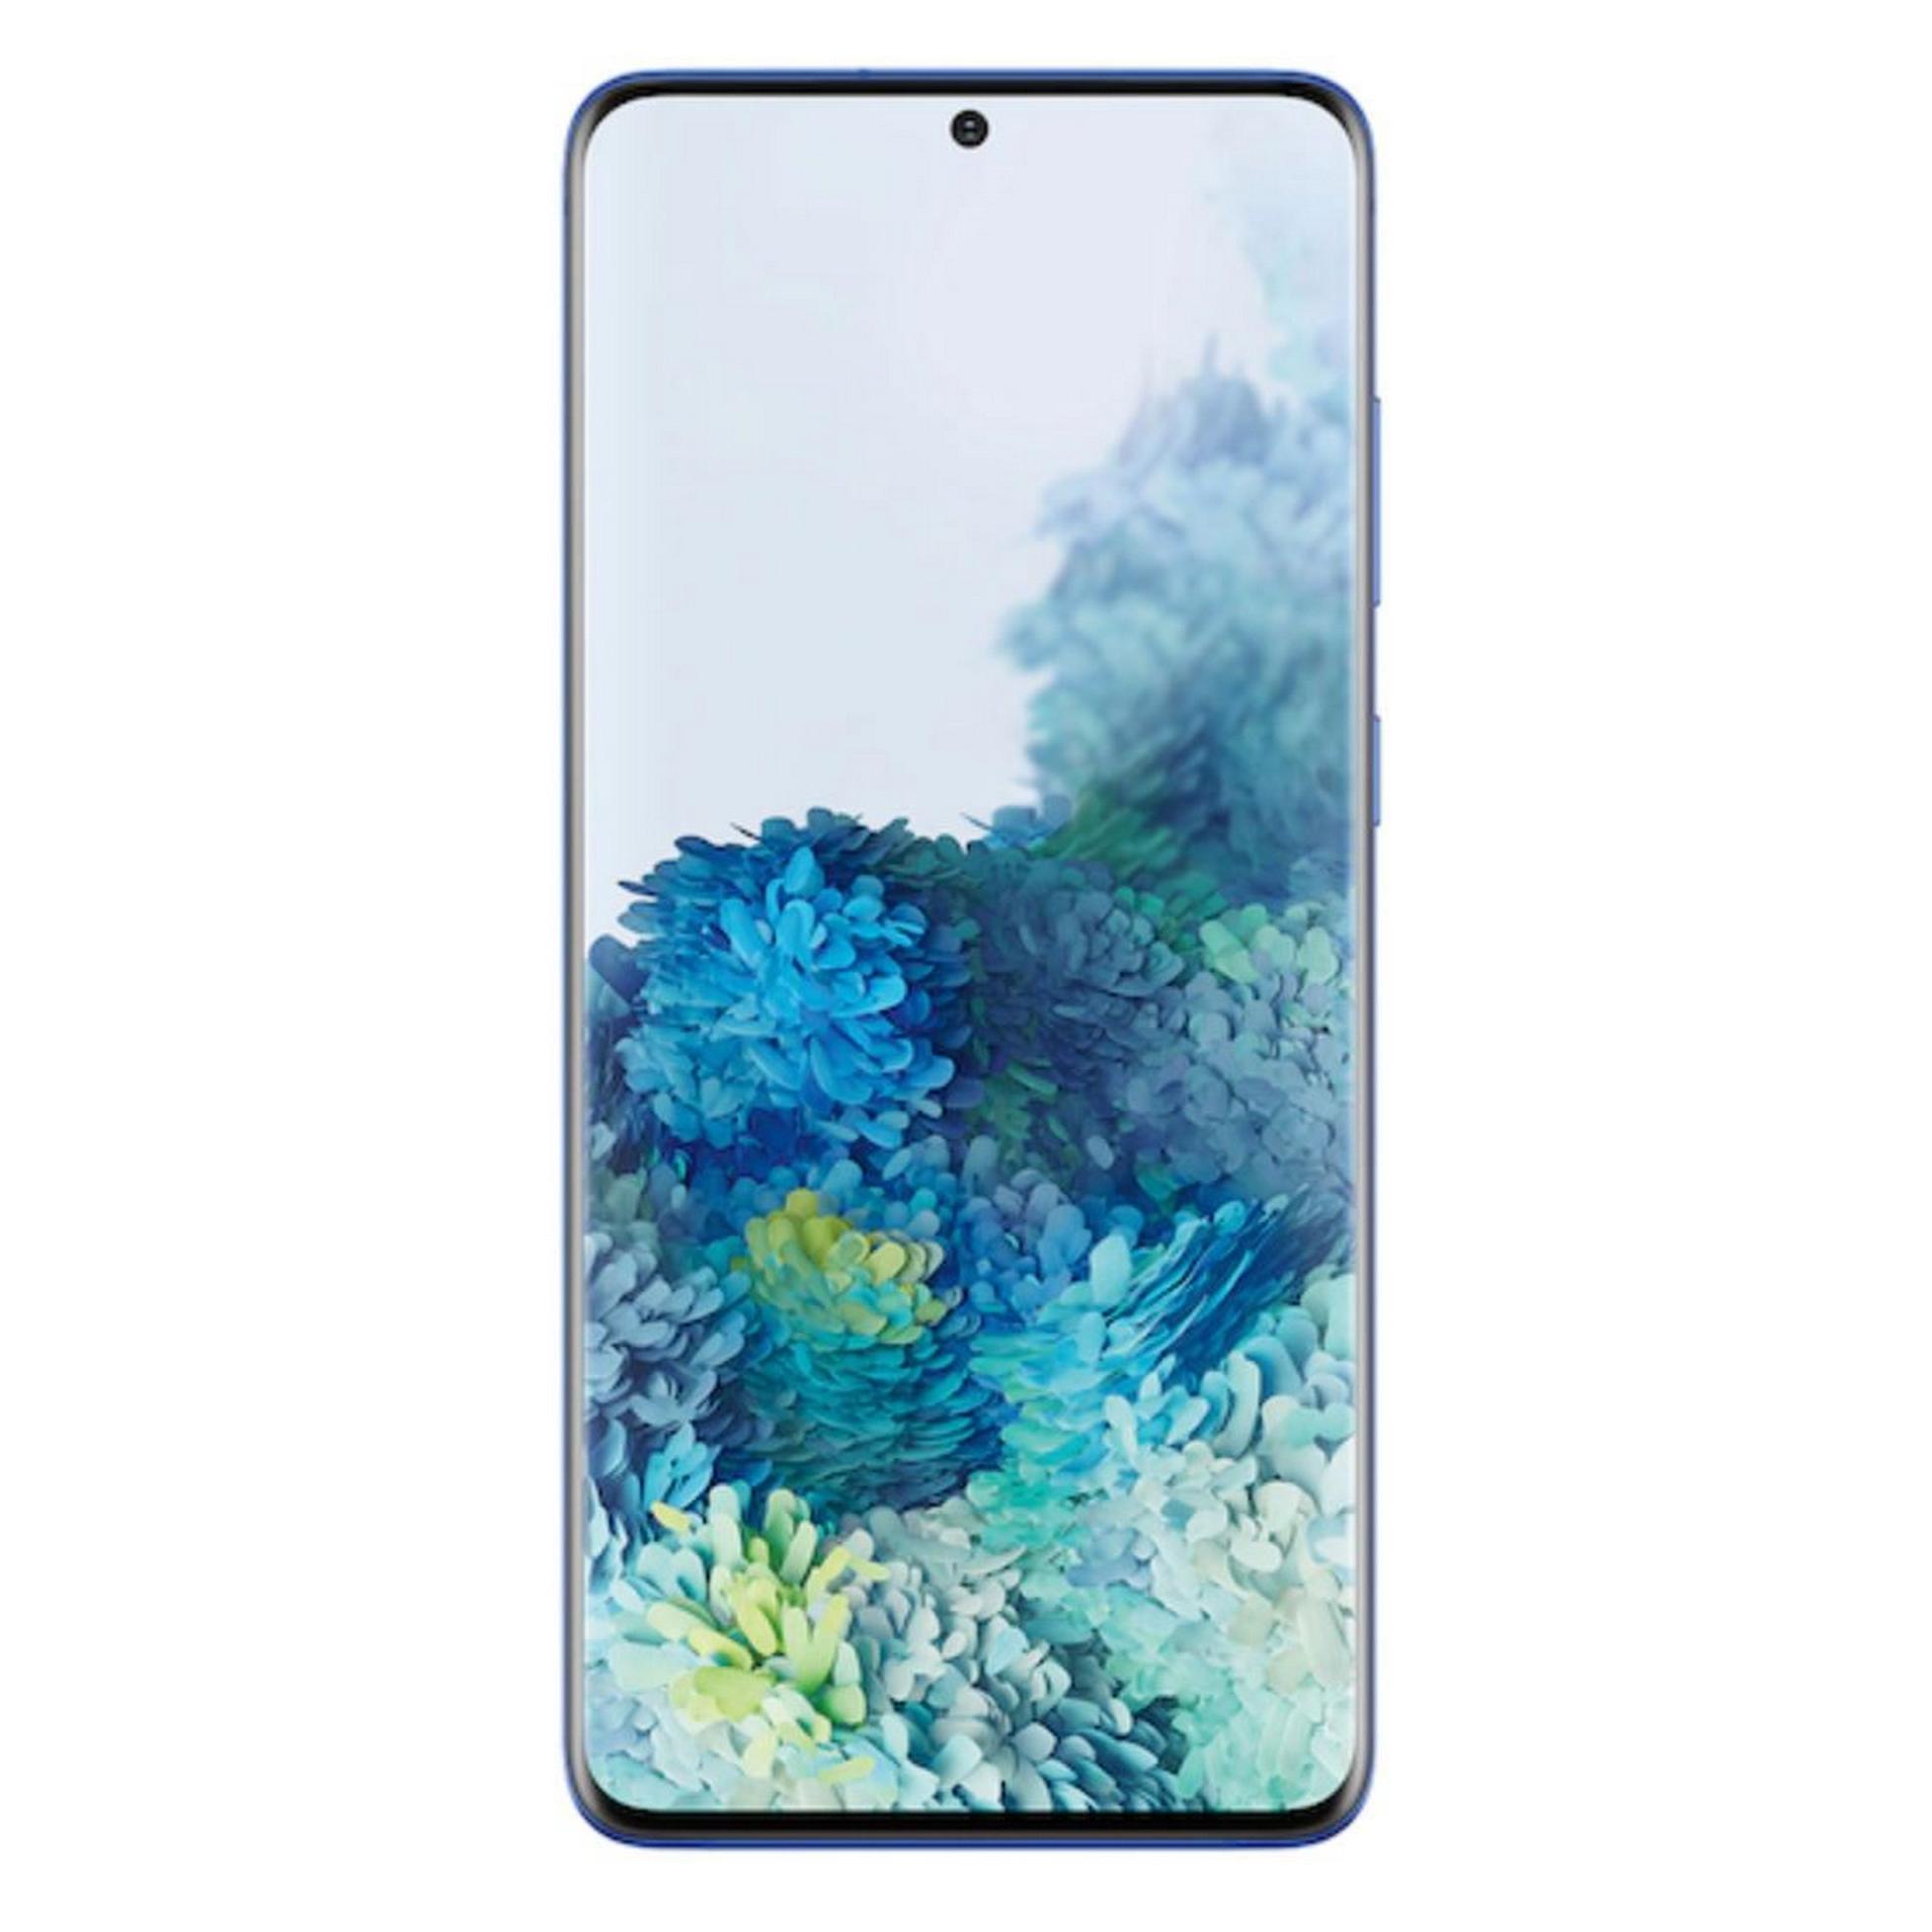 Galaxy S20 Plus 5G Verizon